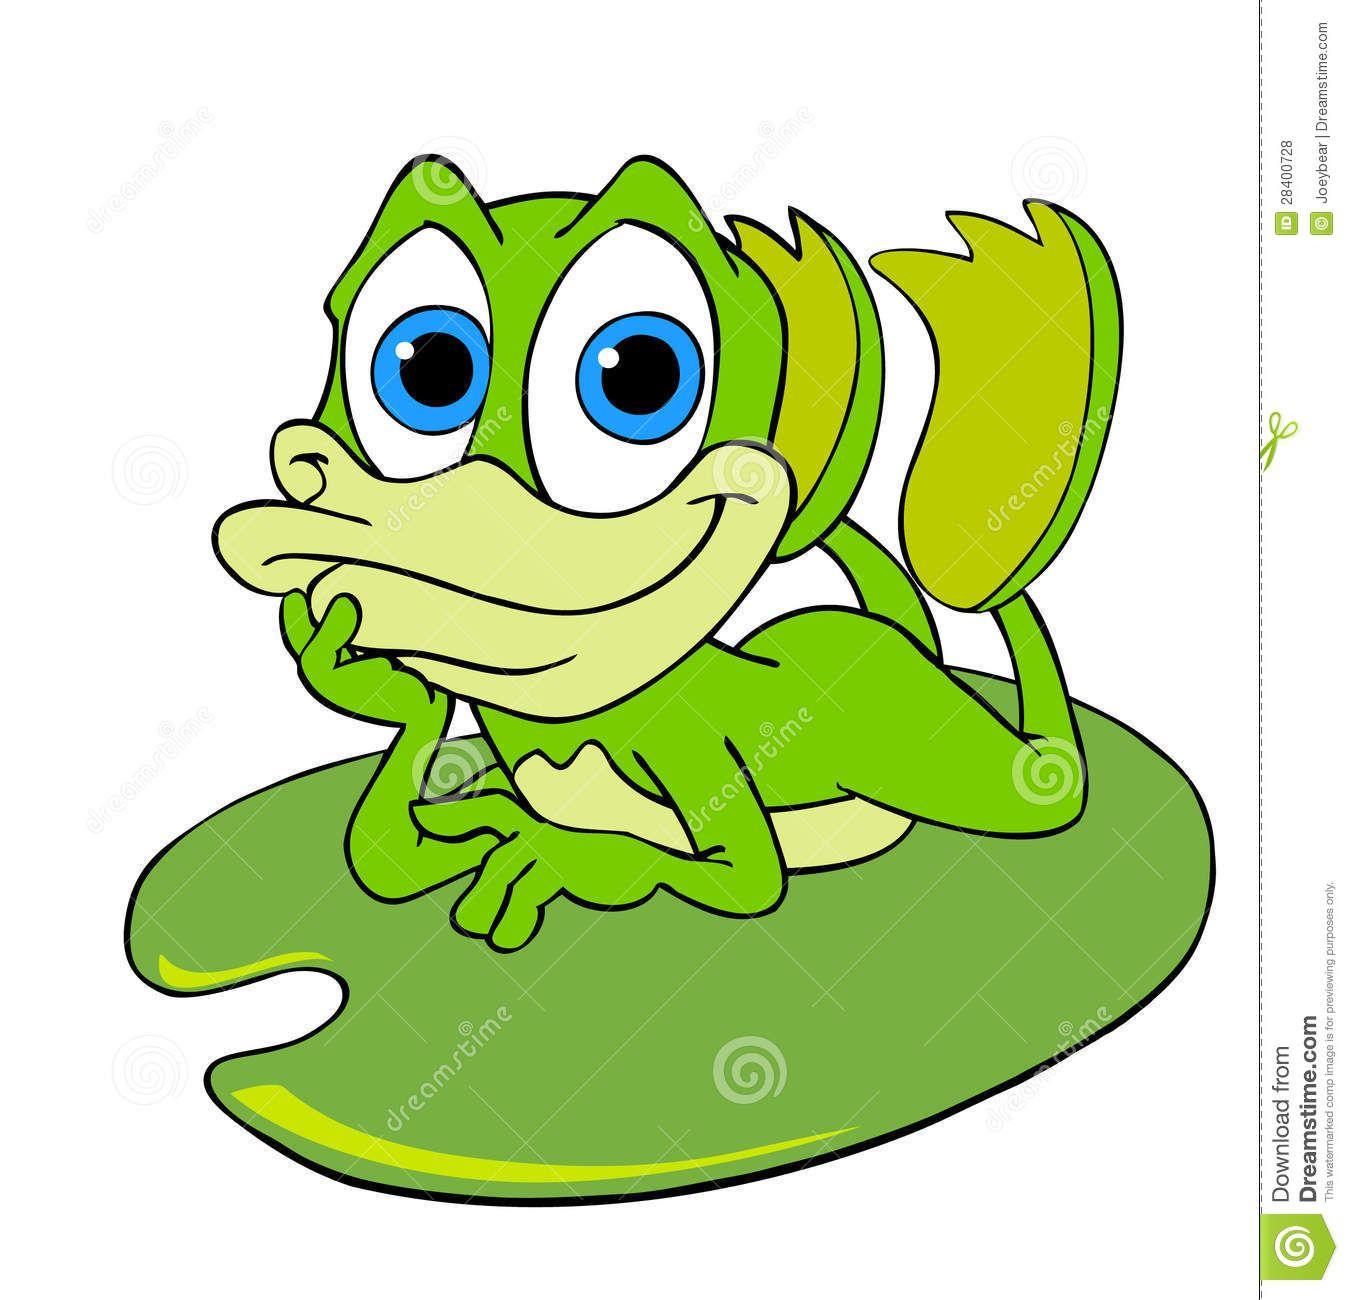 bullfrog stock illustrations vectors clipart 129 stock rh pinterest com